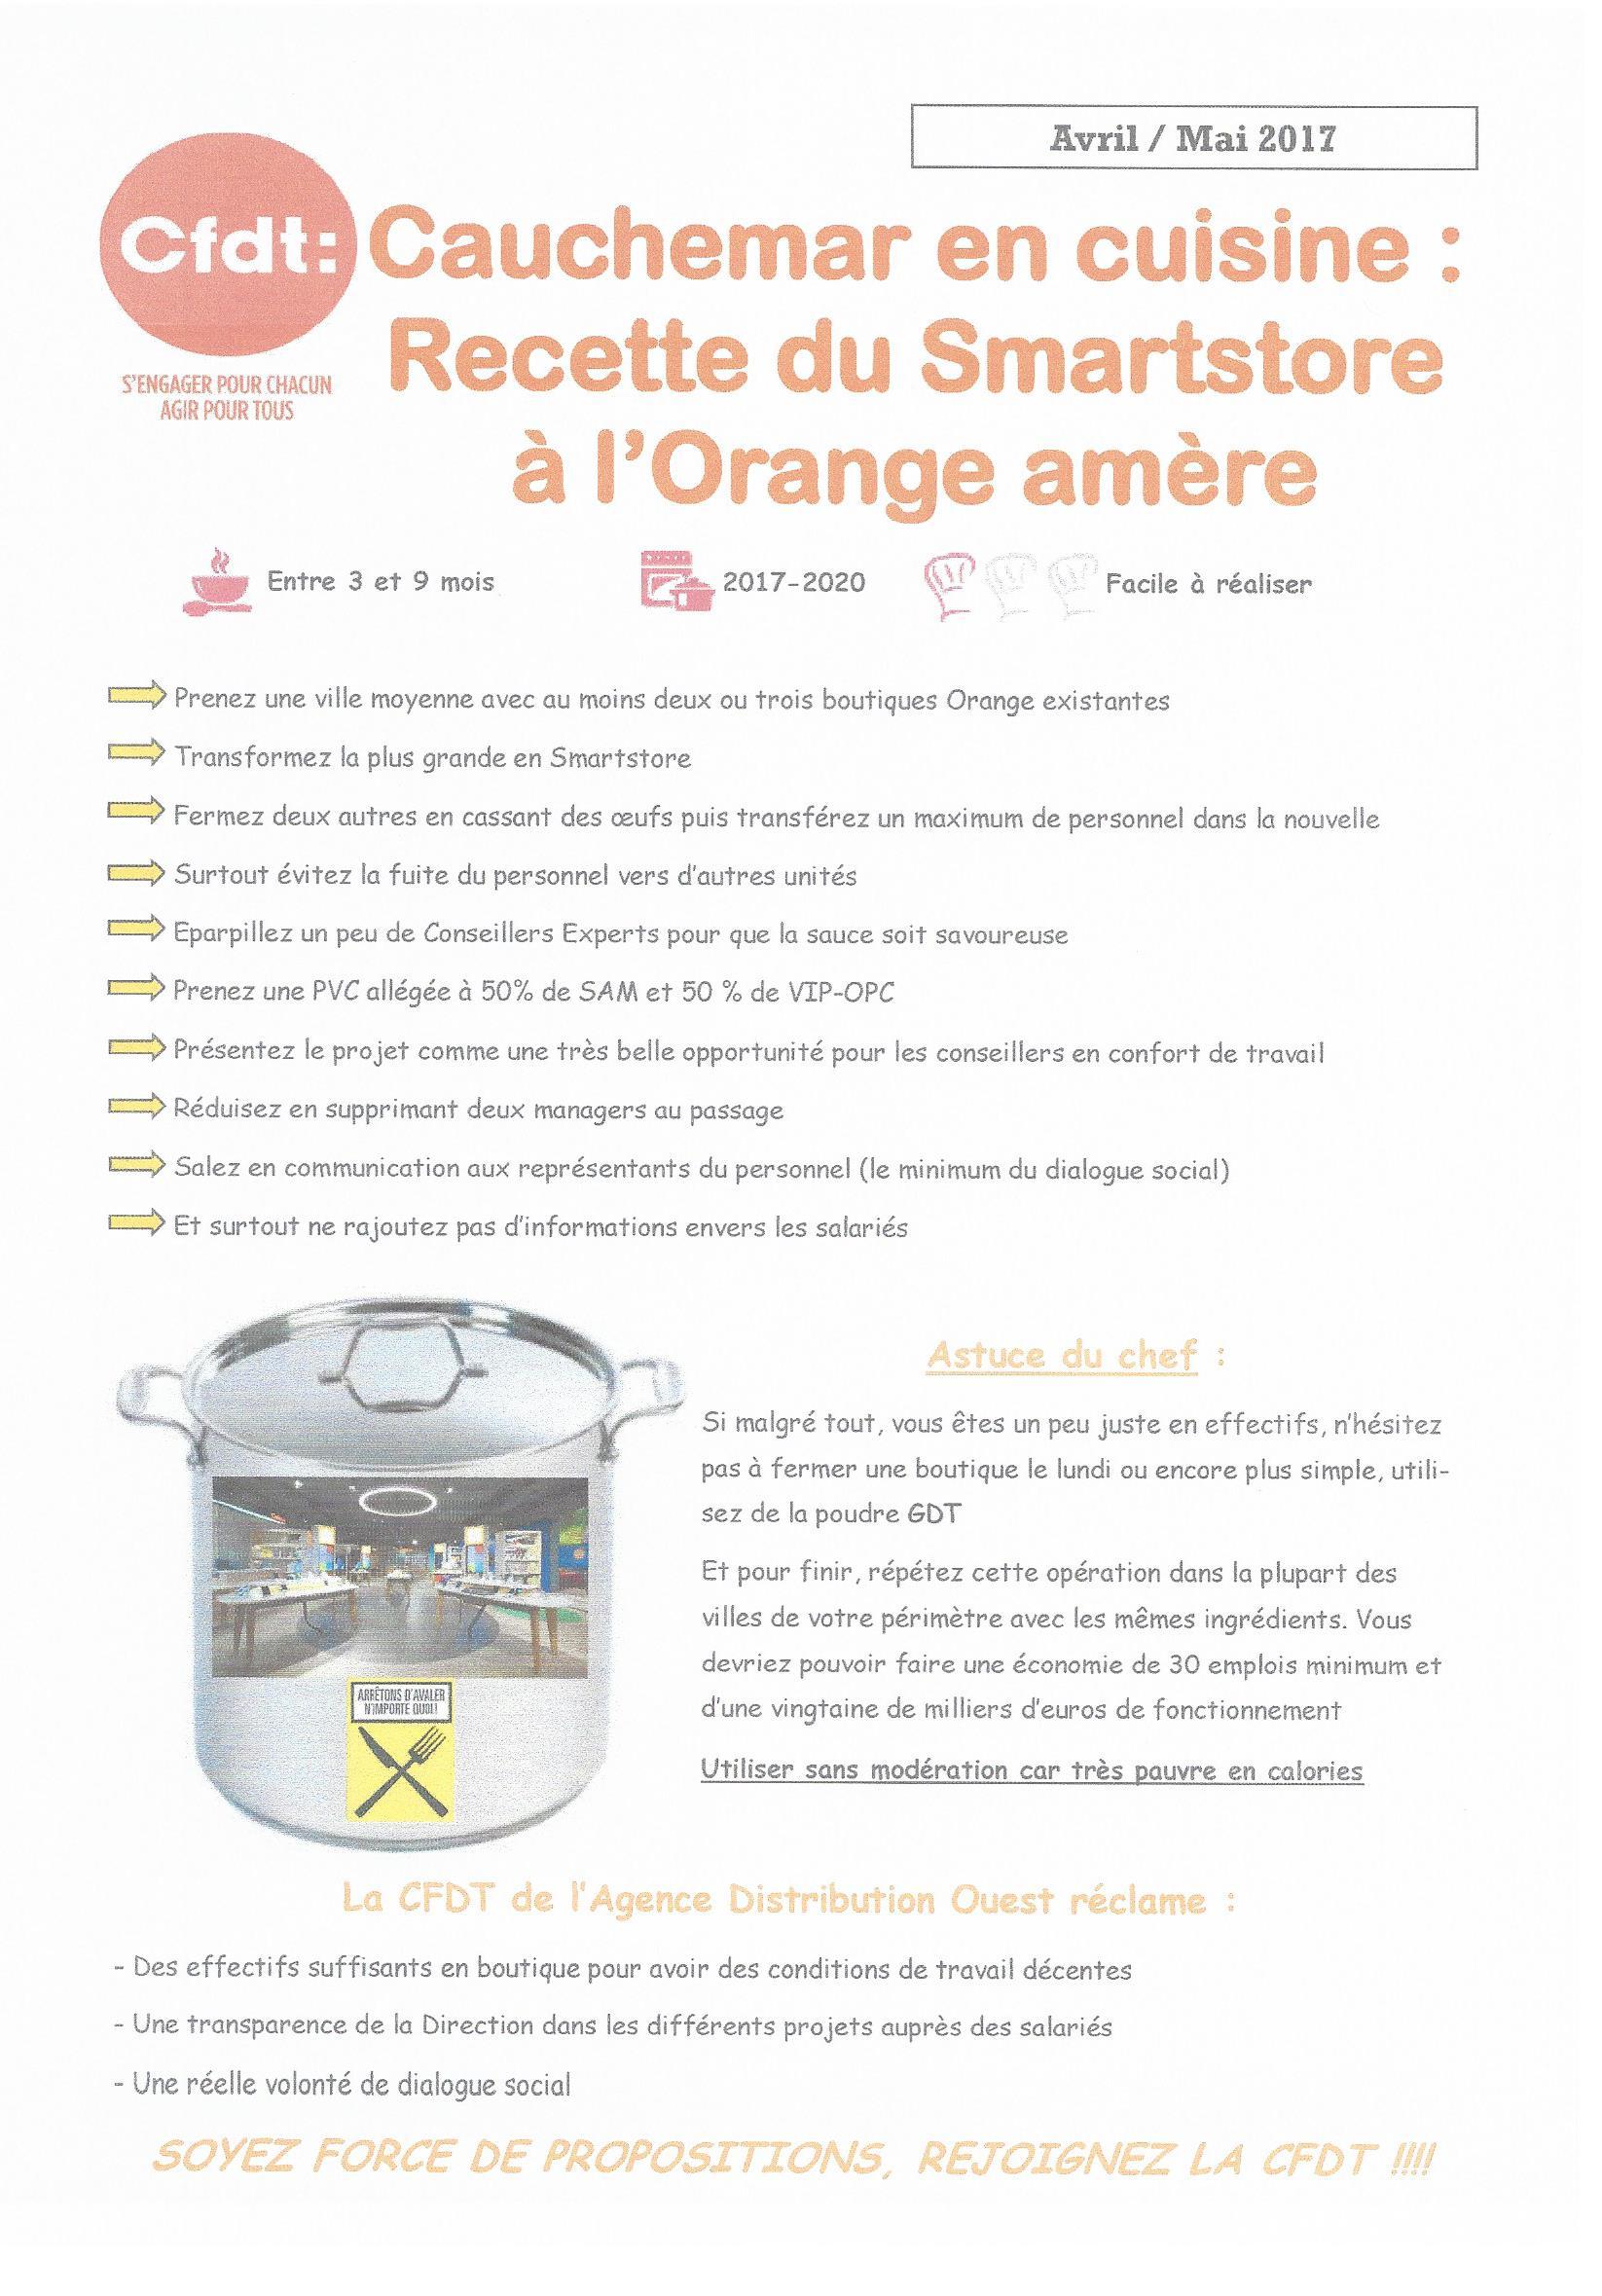 Orange cauchemar en cuisine recette du smartstore l 39 orange am re - Recette cauchemar en cuisine ...